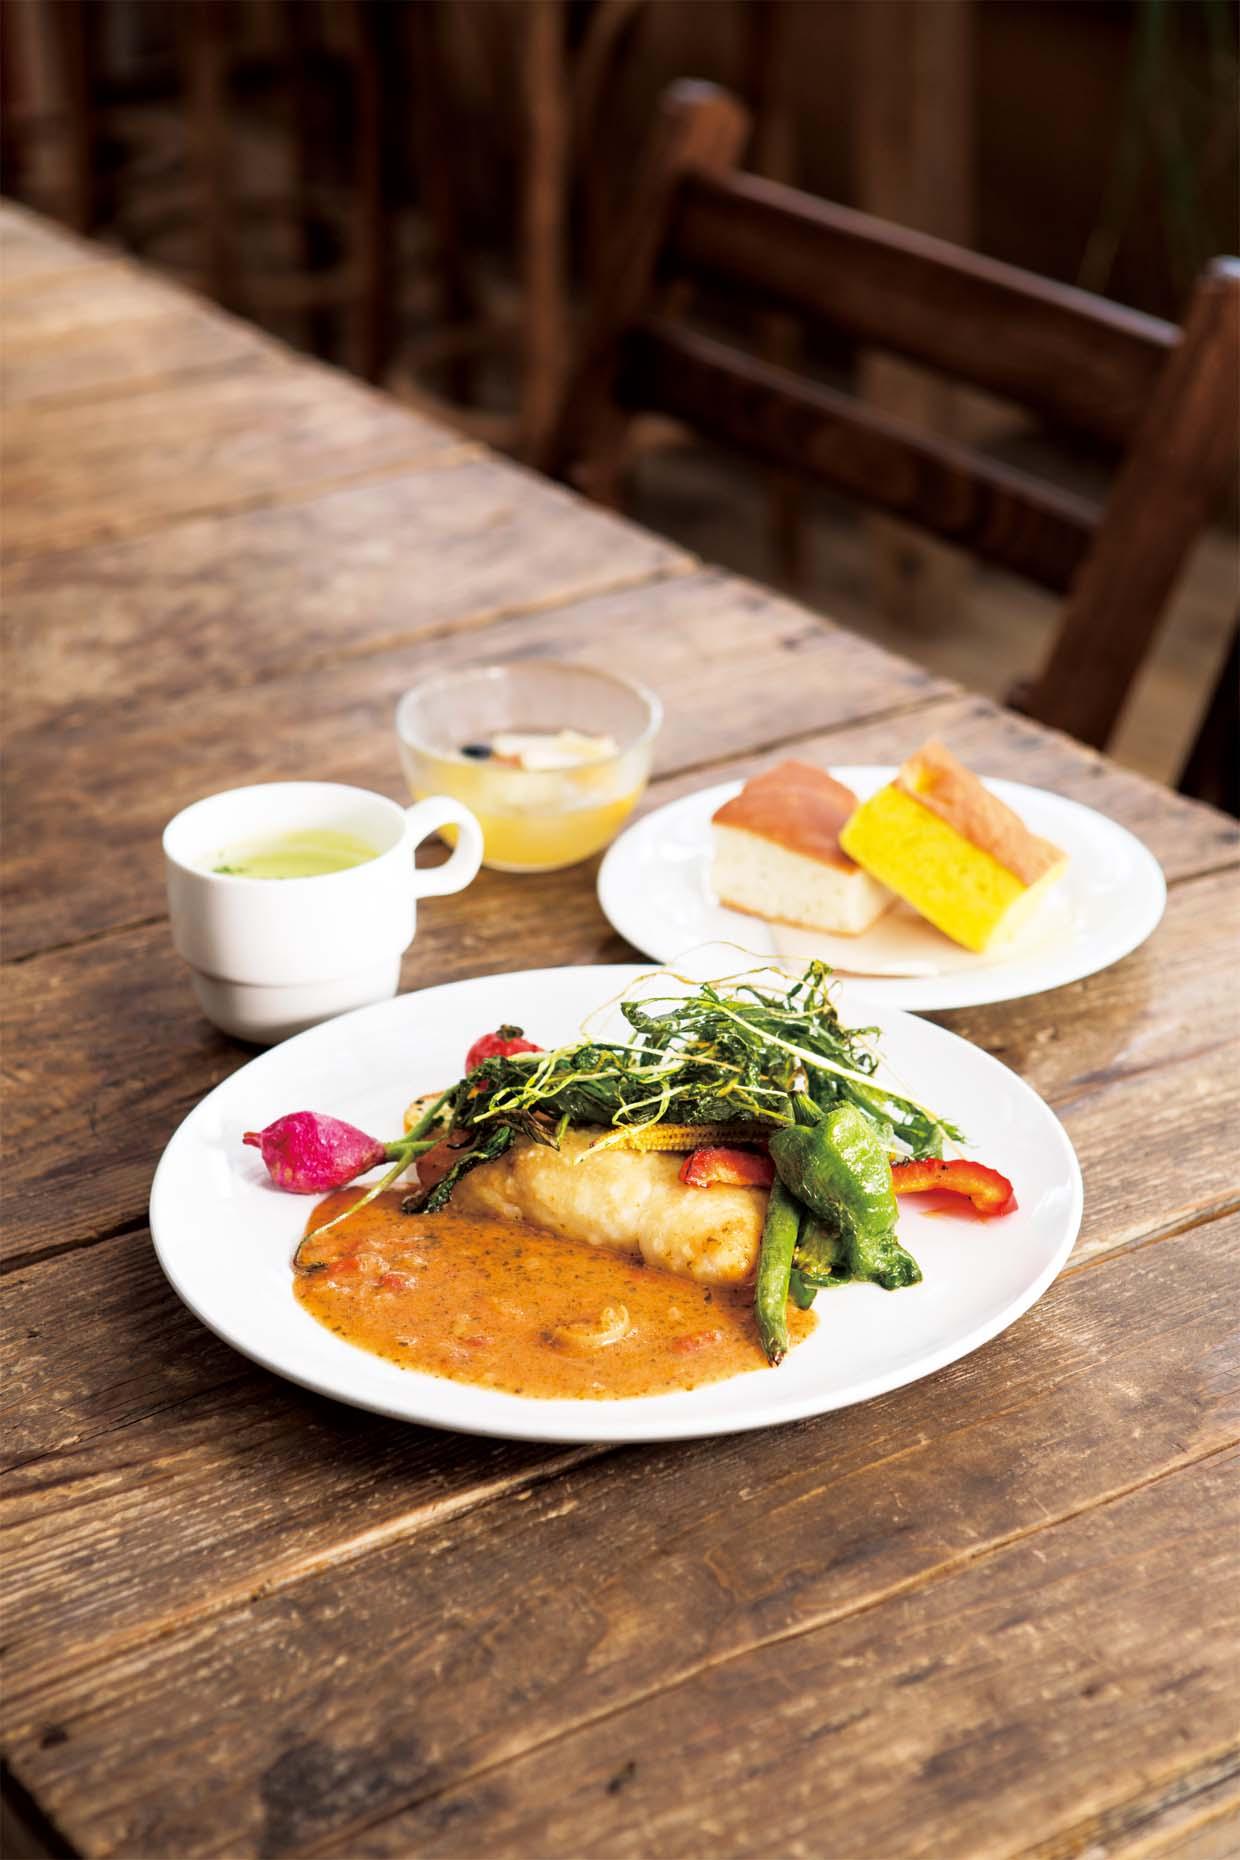 http://www.keikyu.co.jp/information/otoku/yokosuka_mankitsu/restaurant.html